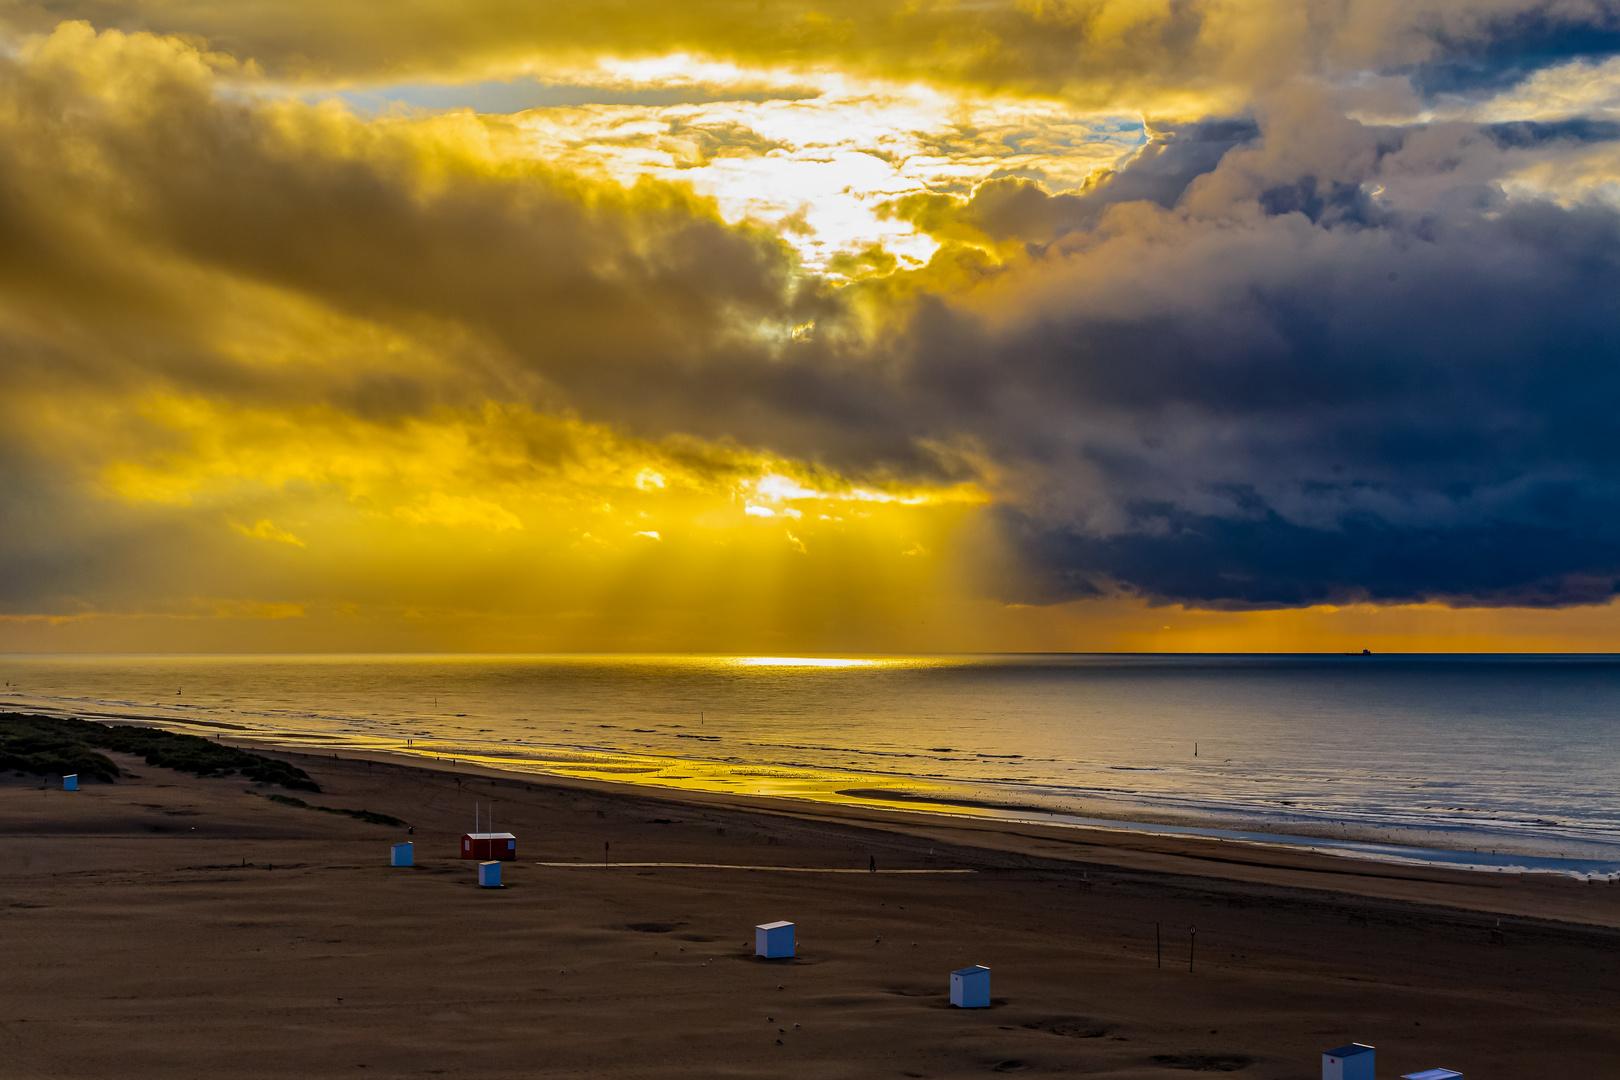 Abends an der Nordsee #3